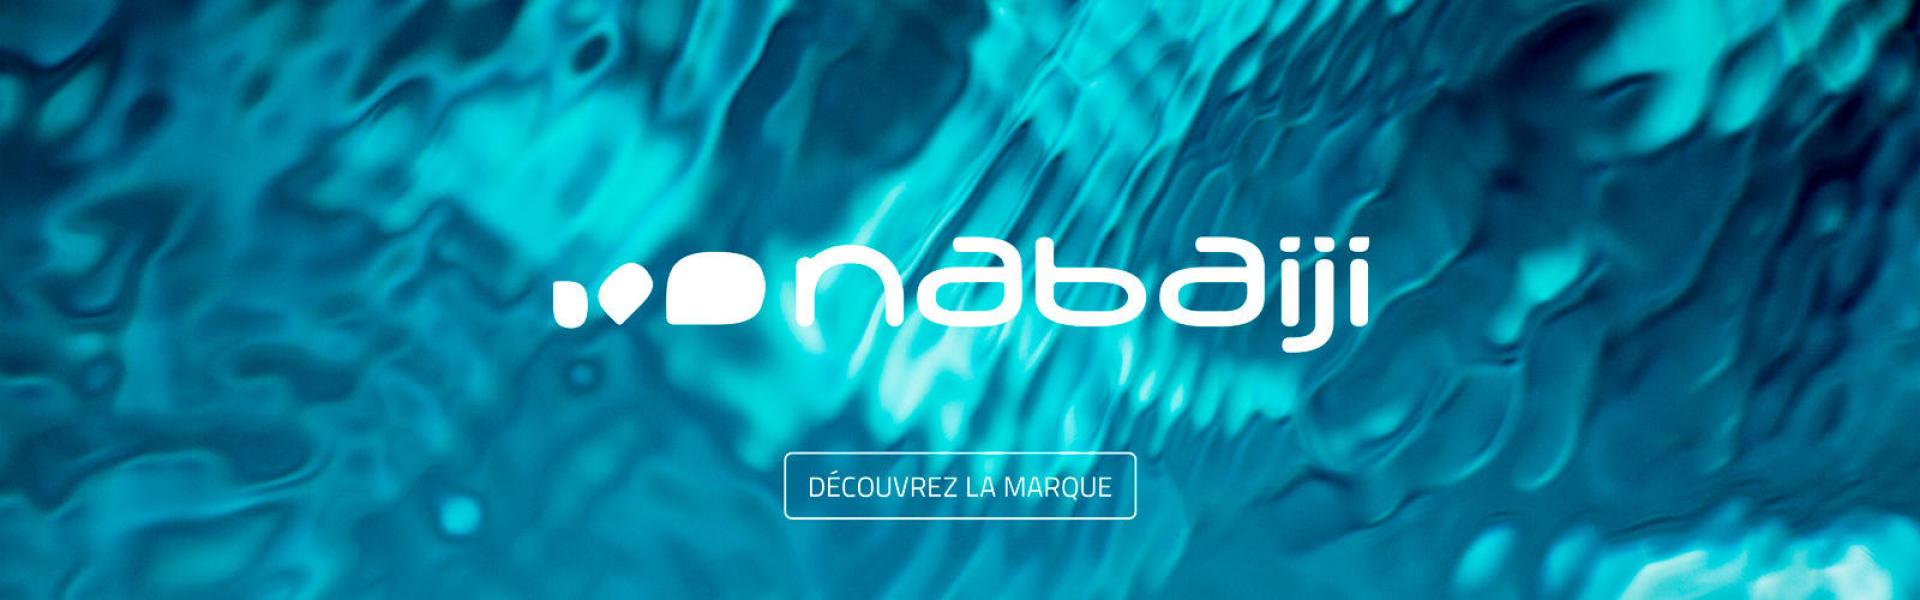 Nabaiji marque de natation